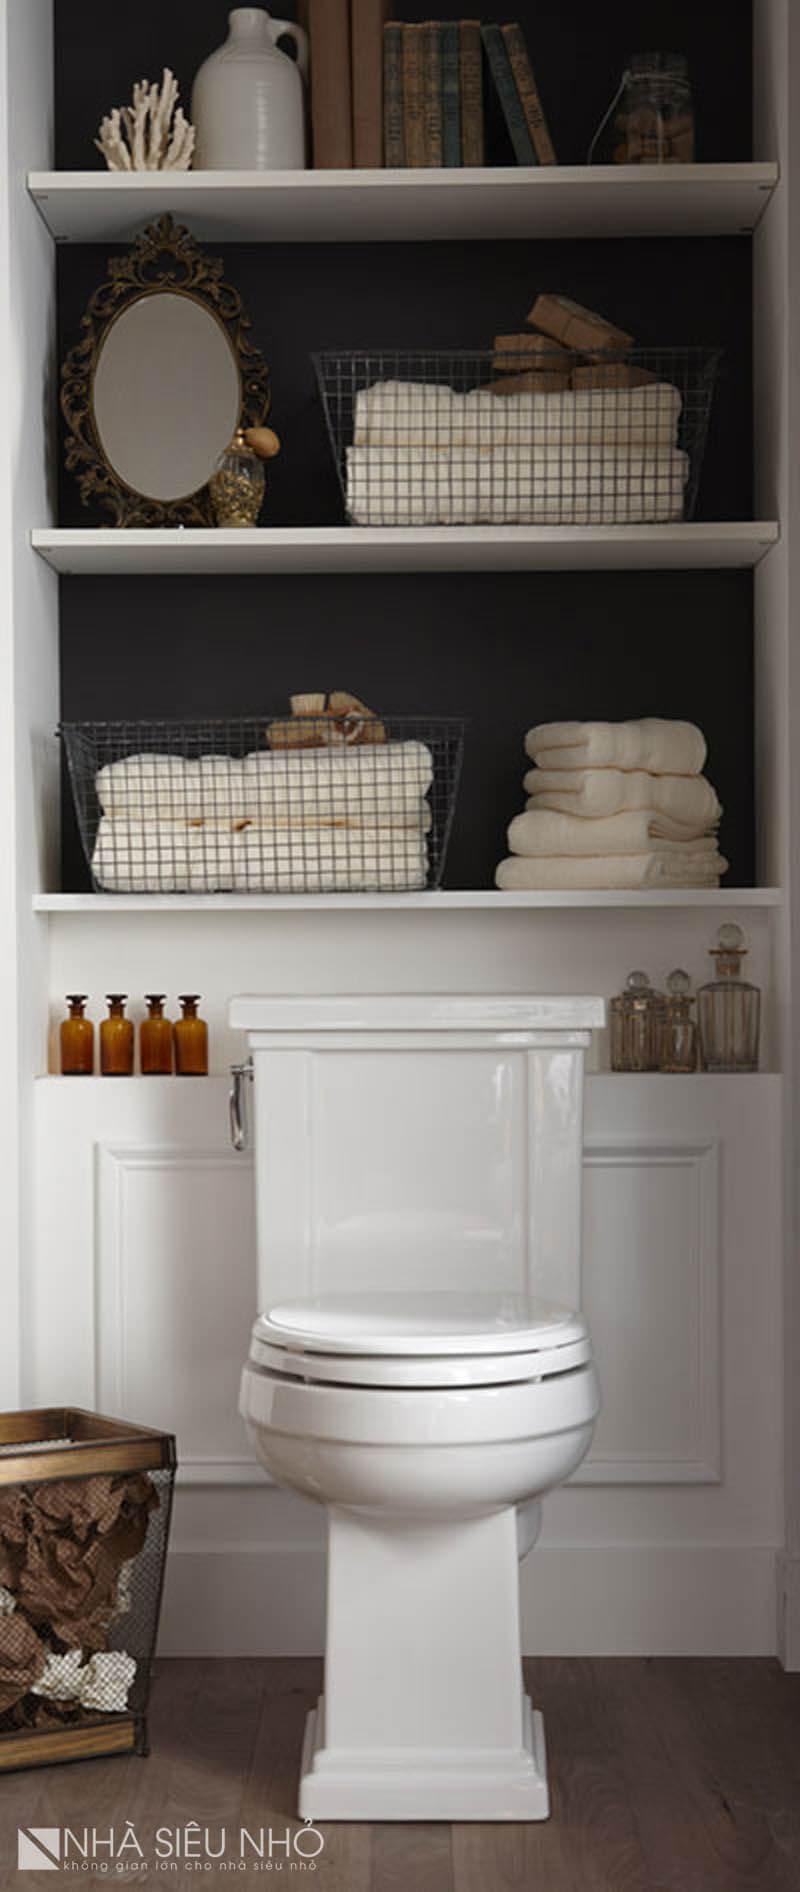 16-small-bathroom-storage-ideas-homebnc